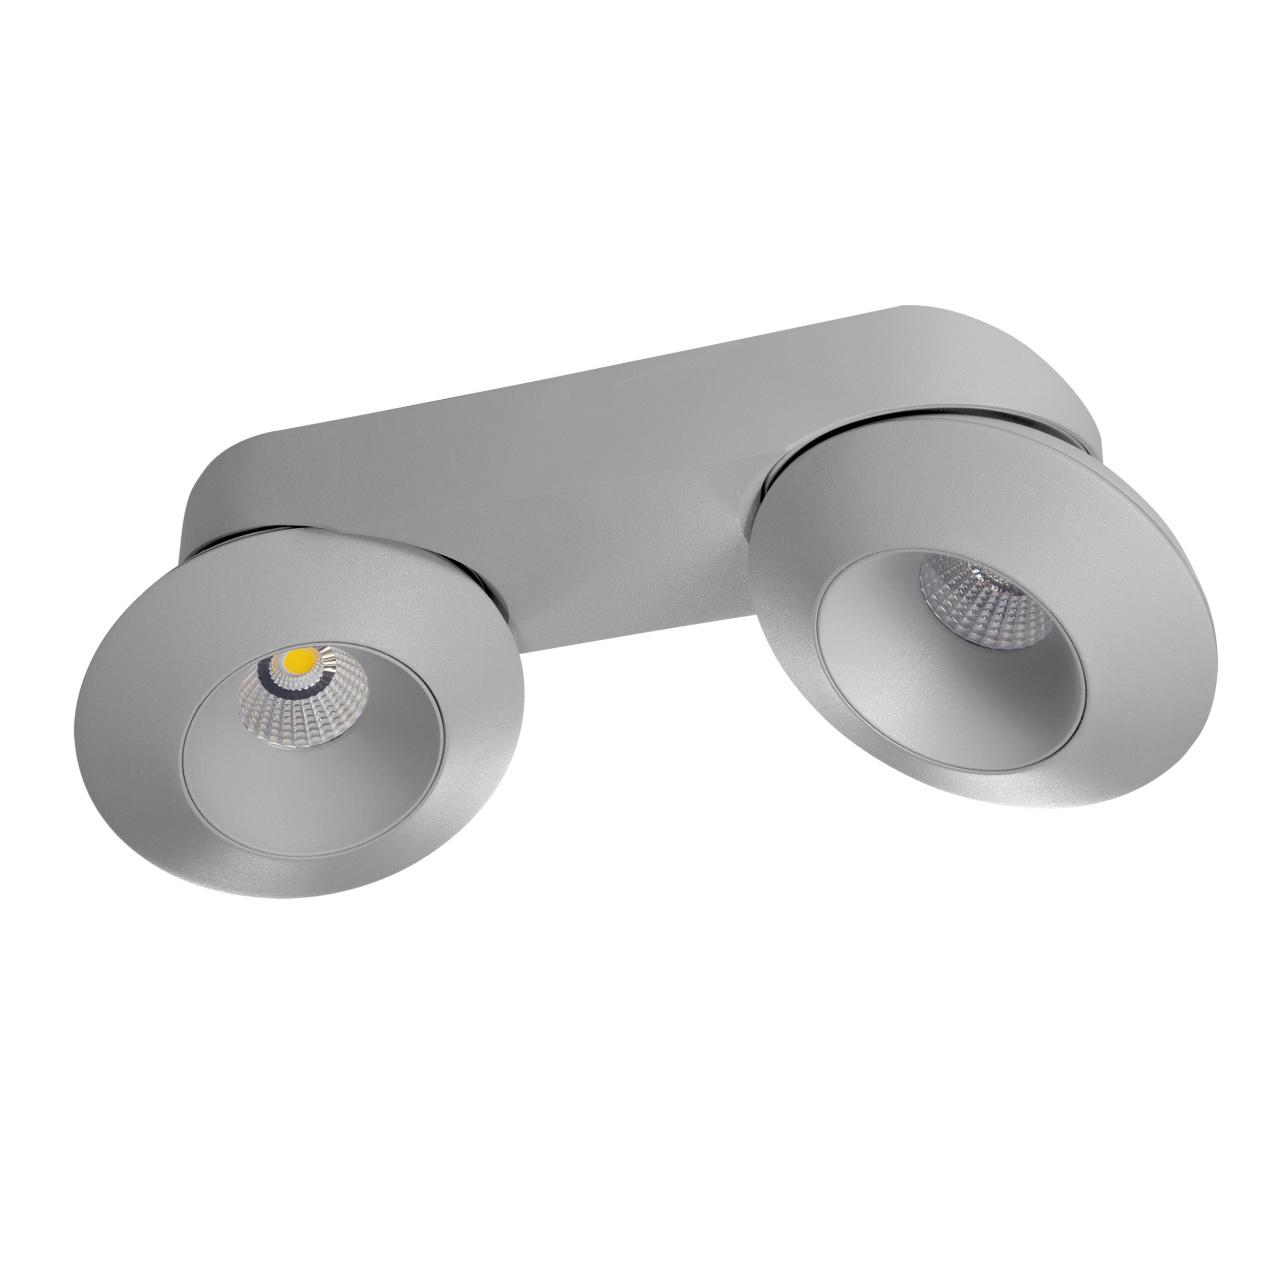 Светильник Orbe LED 32W 2480LM 60G серый 4000K Lightstar 051229